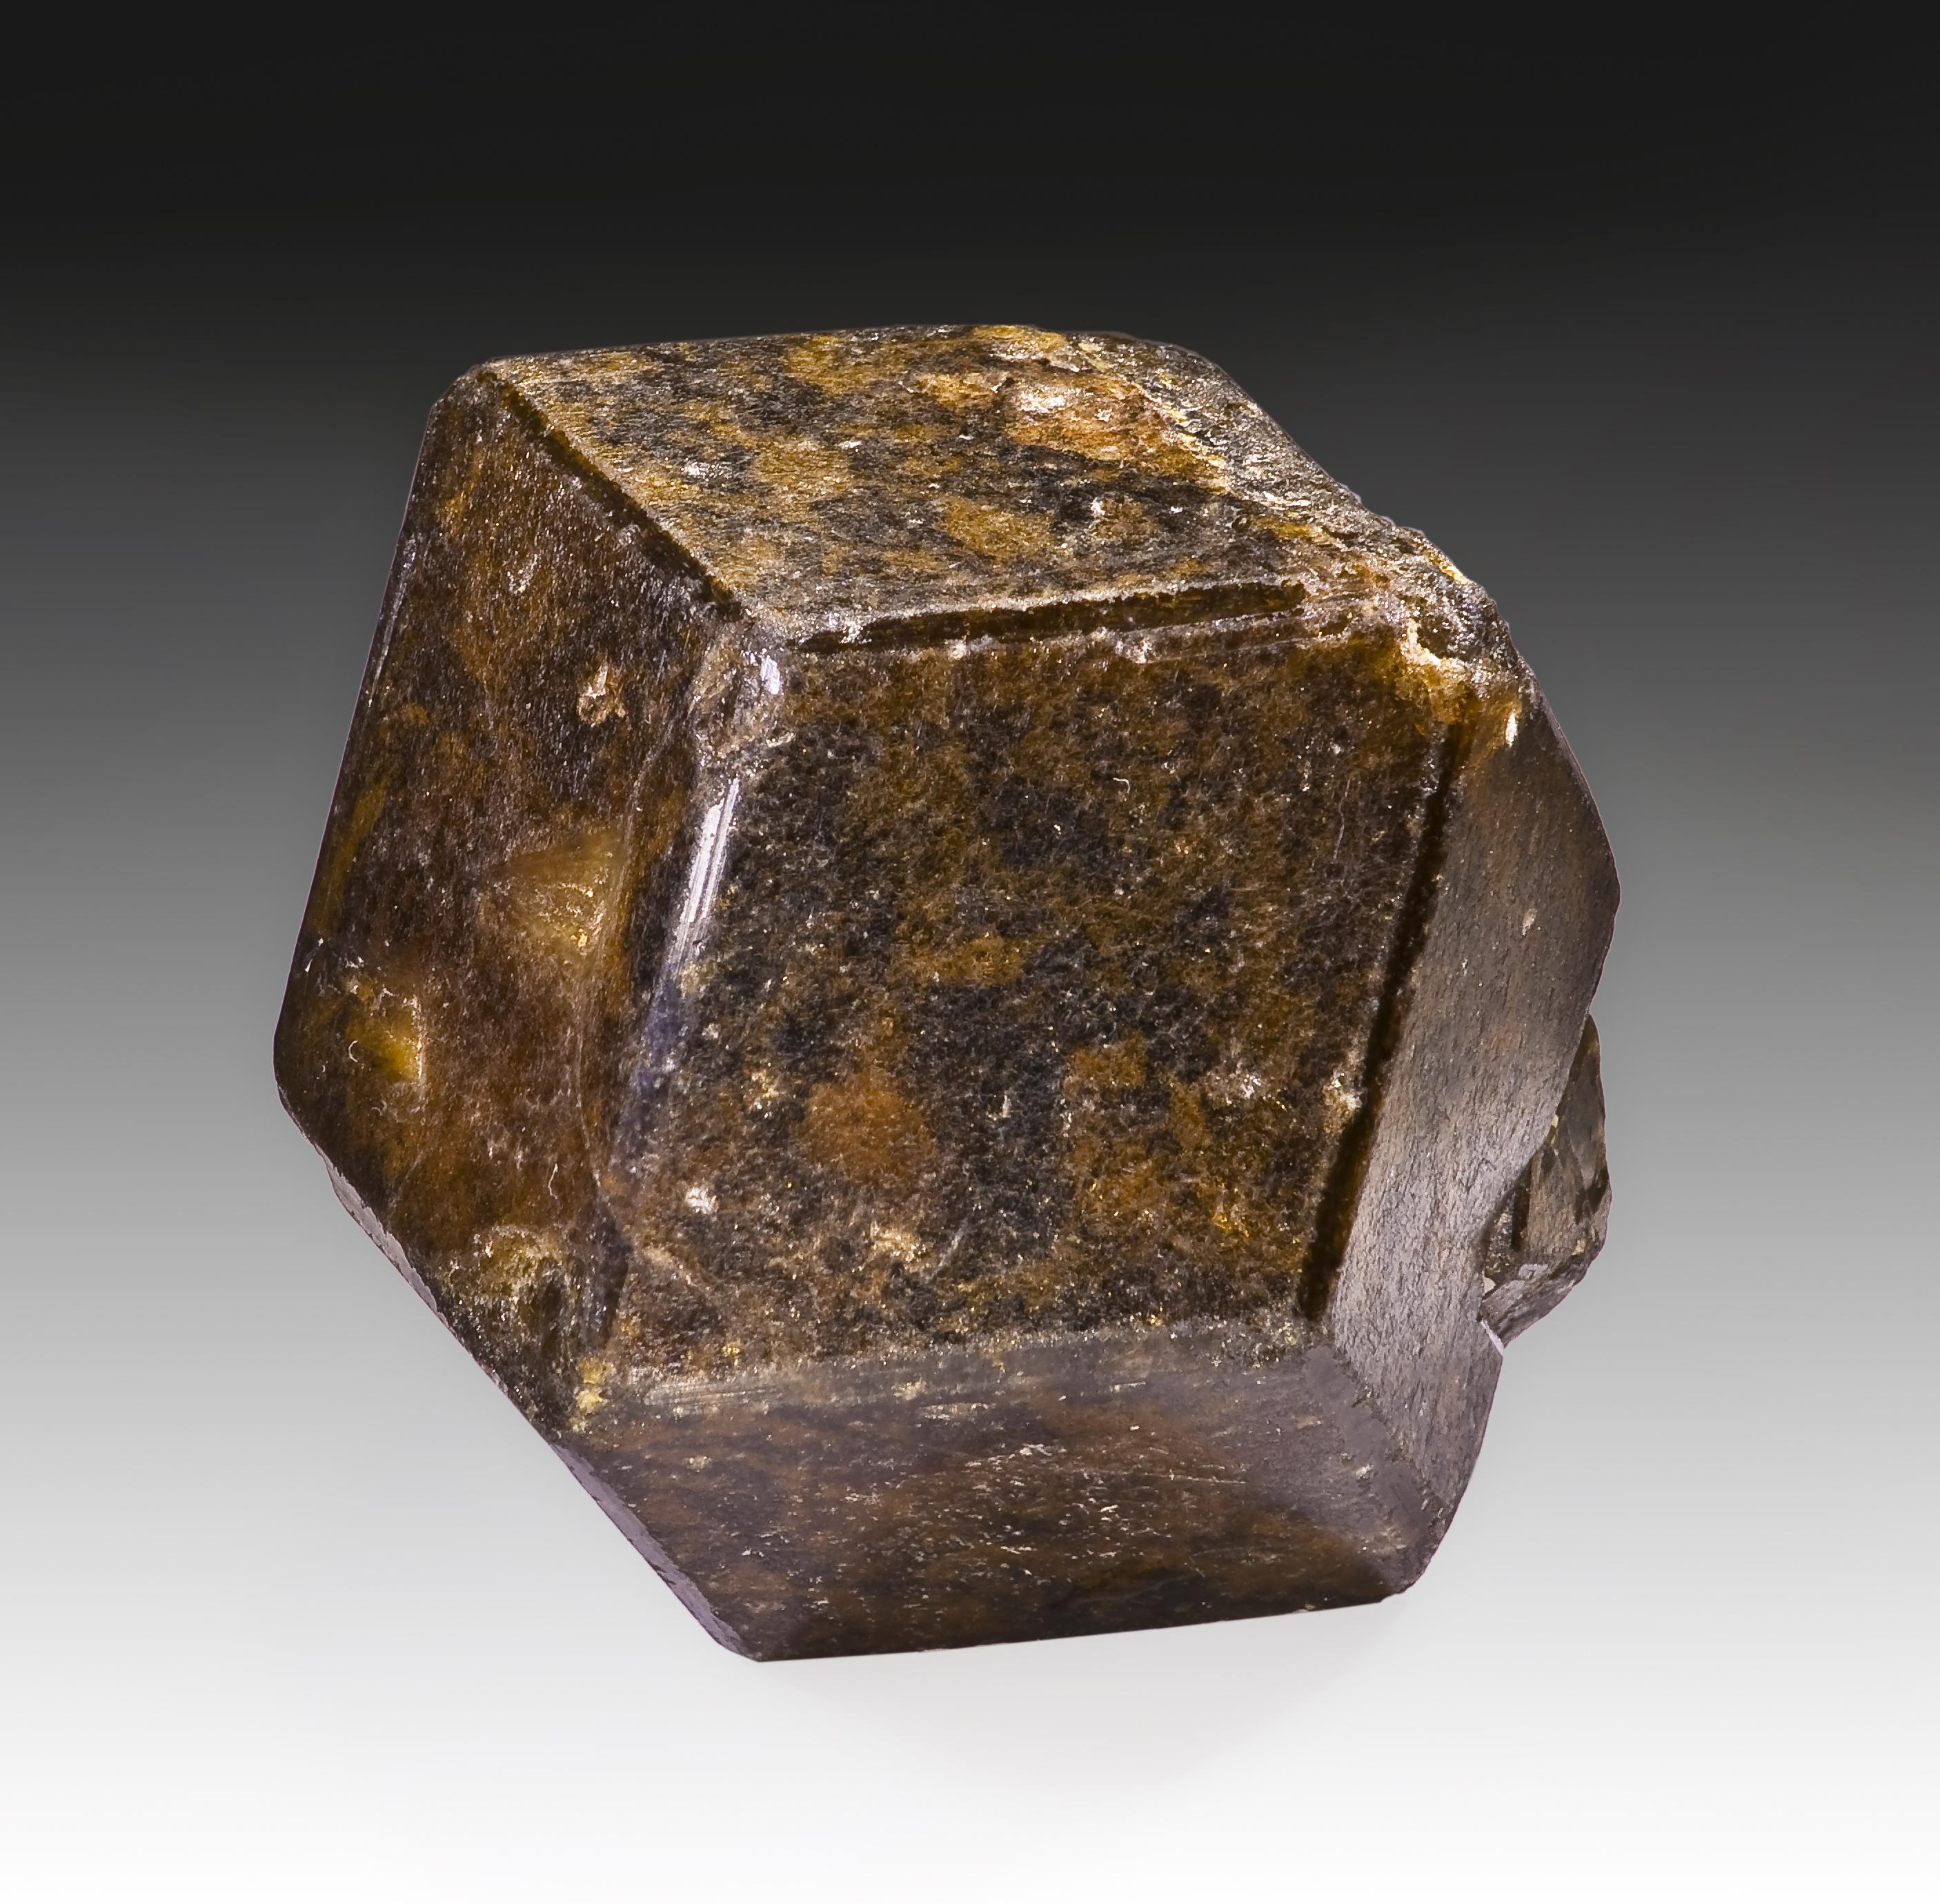 uvarovite symmetry Spessartine is found in granite pegmatites and metamorphosed manganese-rich  rocks, while uvarovite is the rarest garnet variety, only occurring as crusts or.